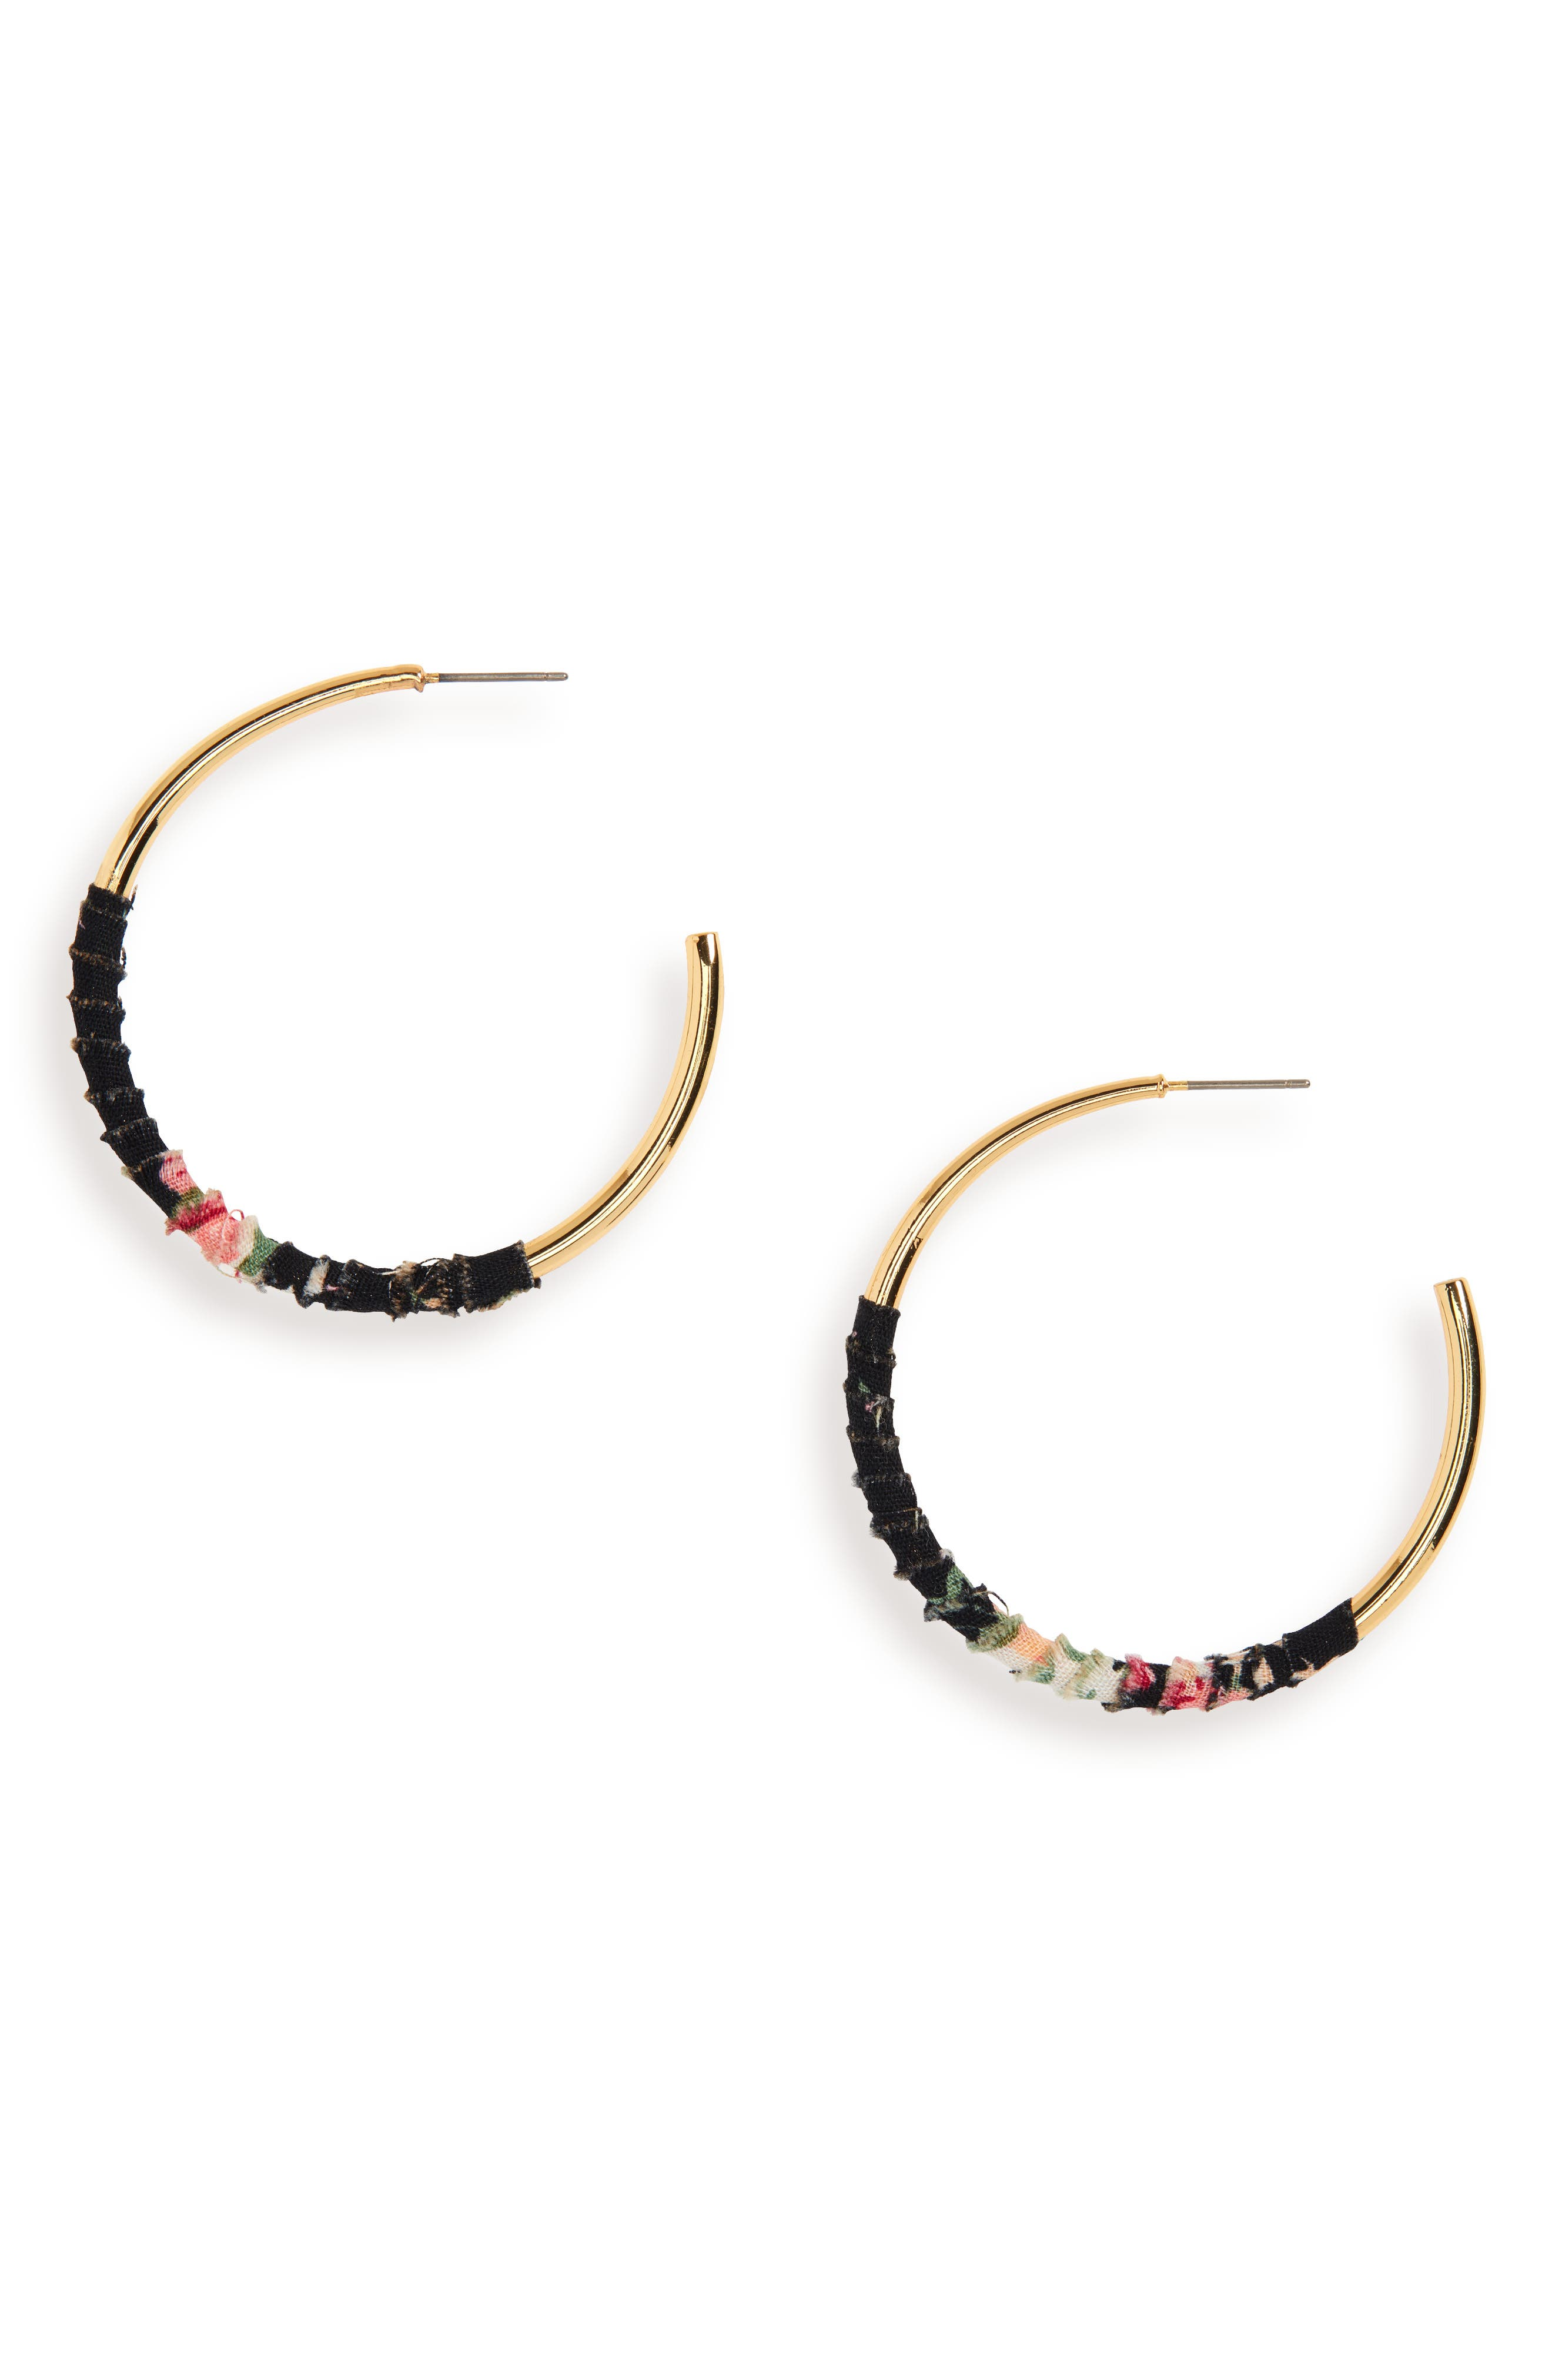 UNCOMMON JAMES BY KRISTIN CAVALLARI Womanizer Hoop Earrings, Main, color, 710